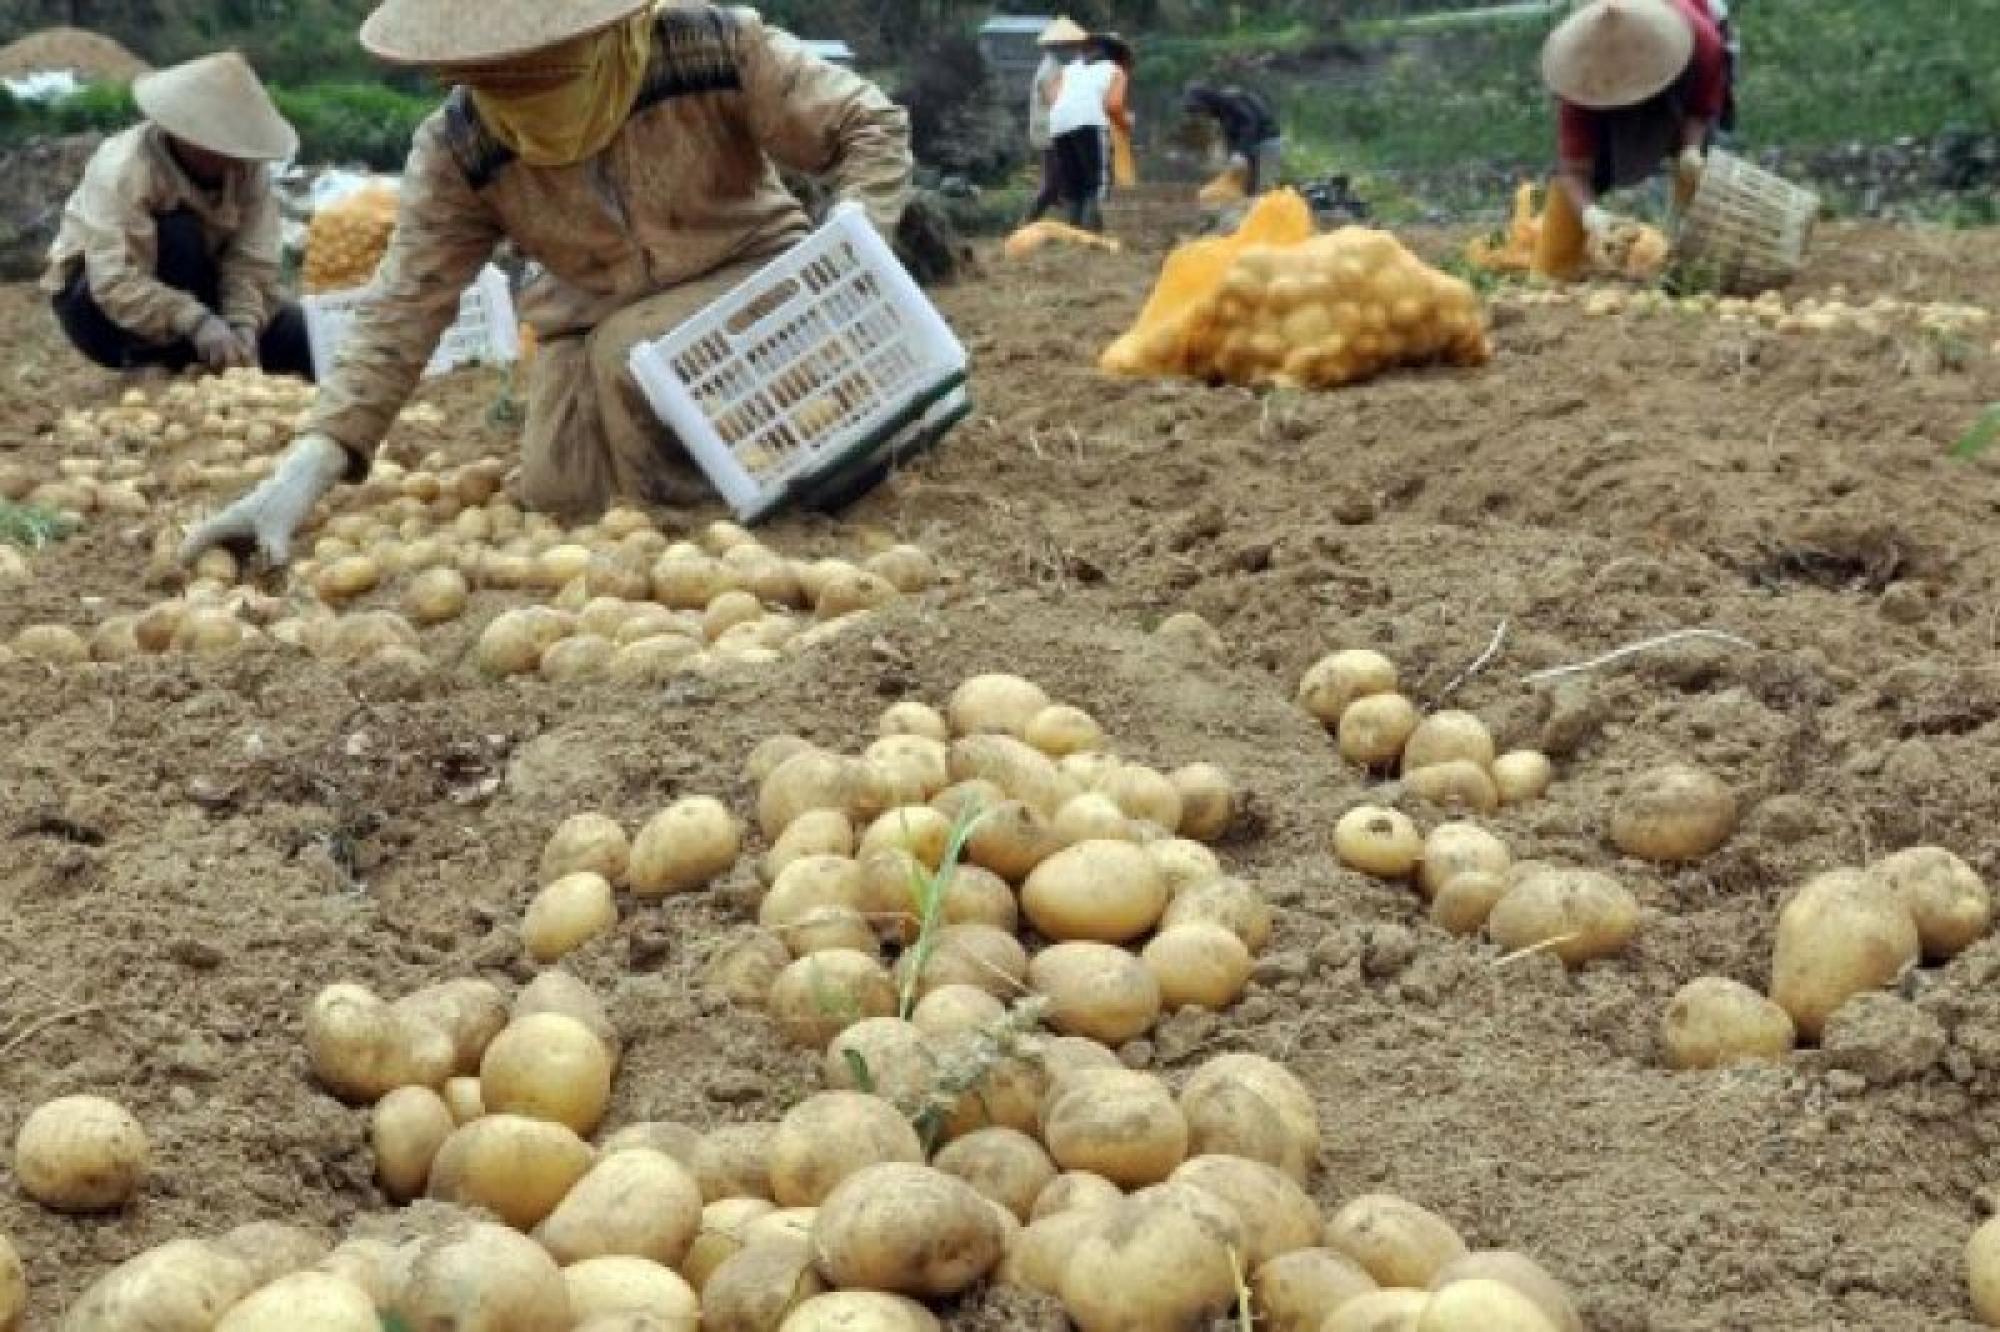 Petani kentang di Kab. Probolinggo. Penghasil keripik kentang yang dikirim ke seluruh Indonesia.